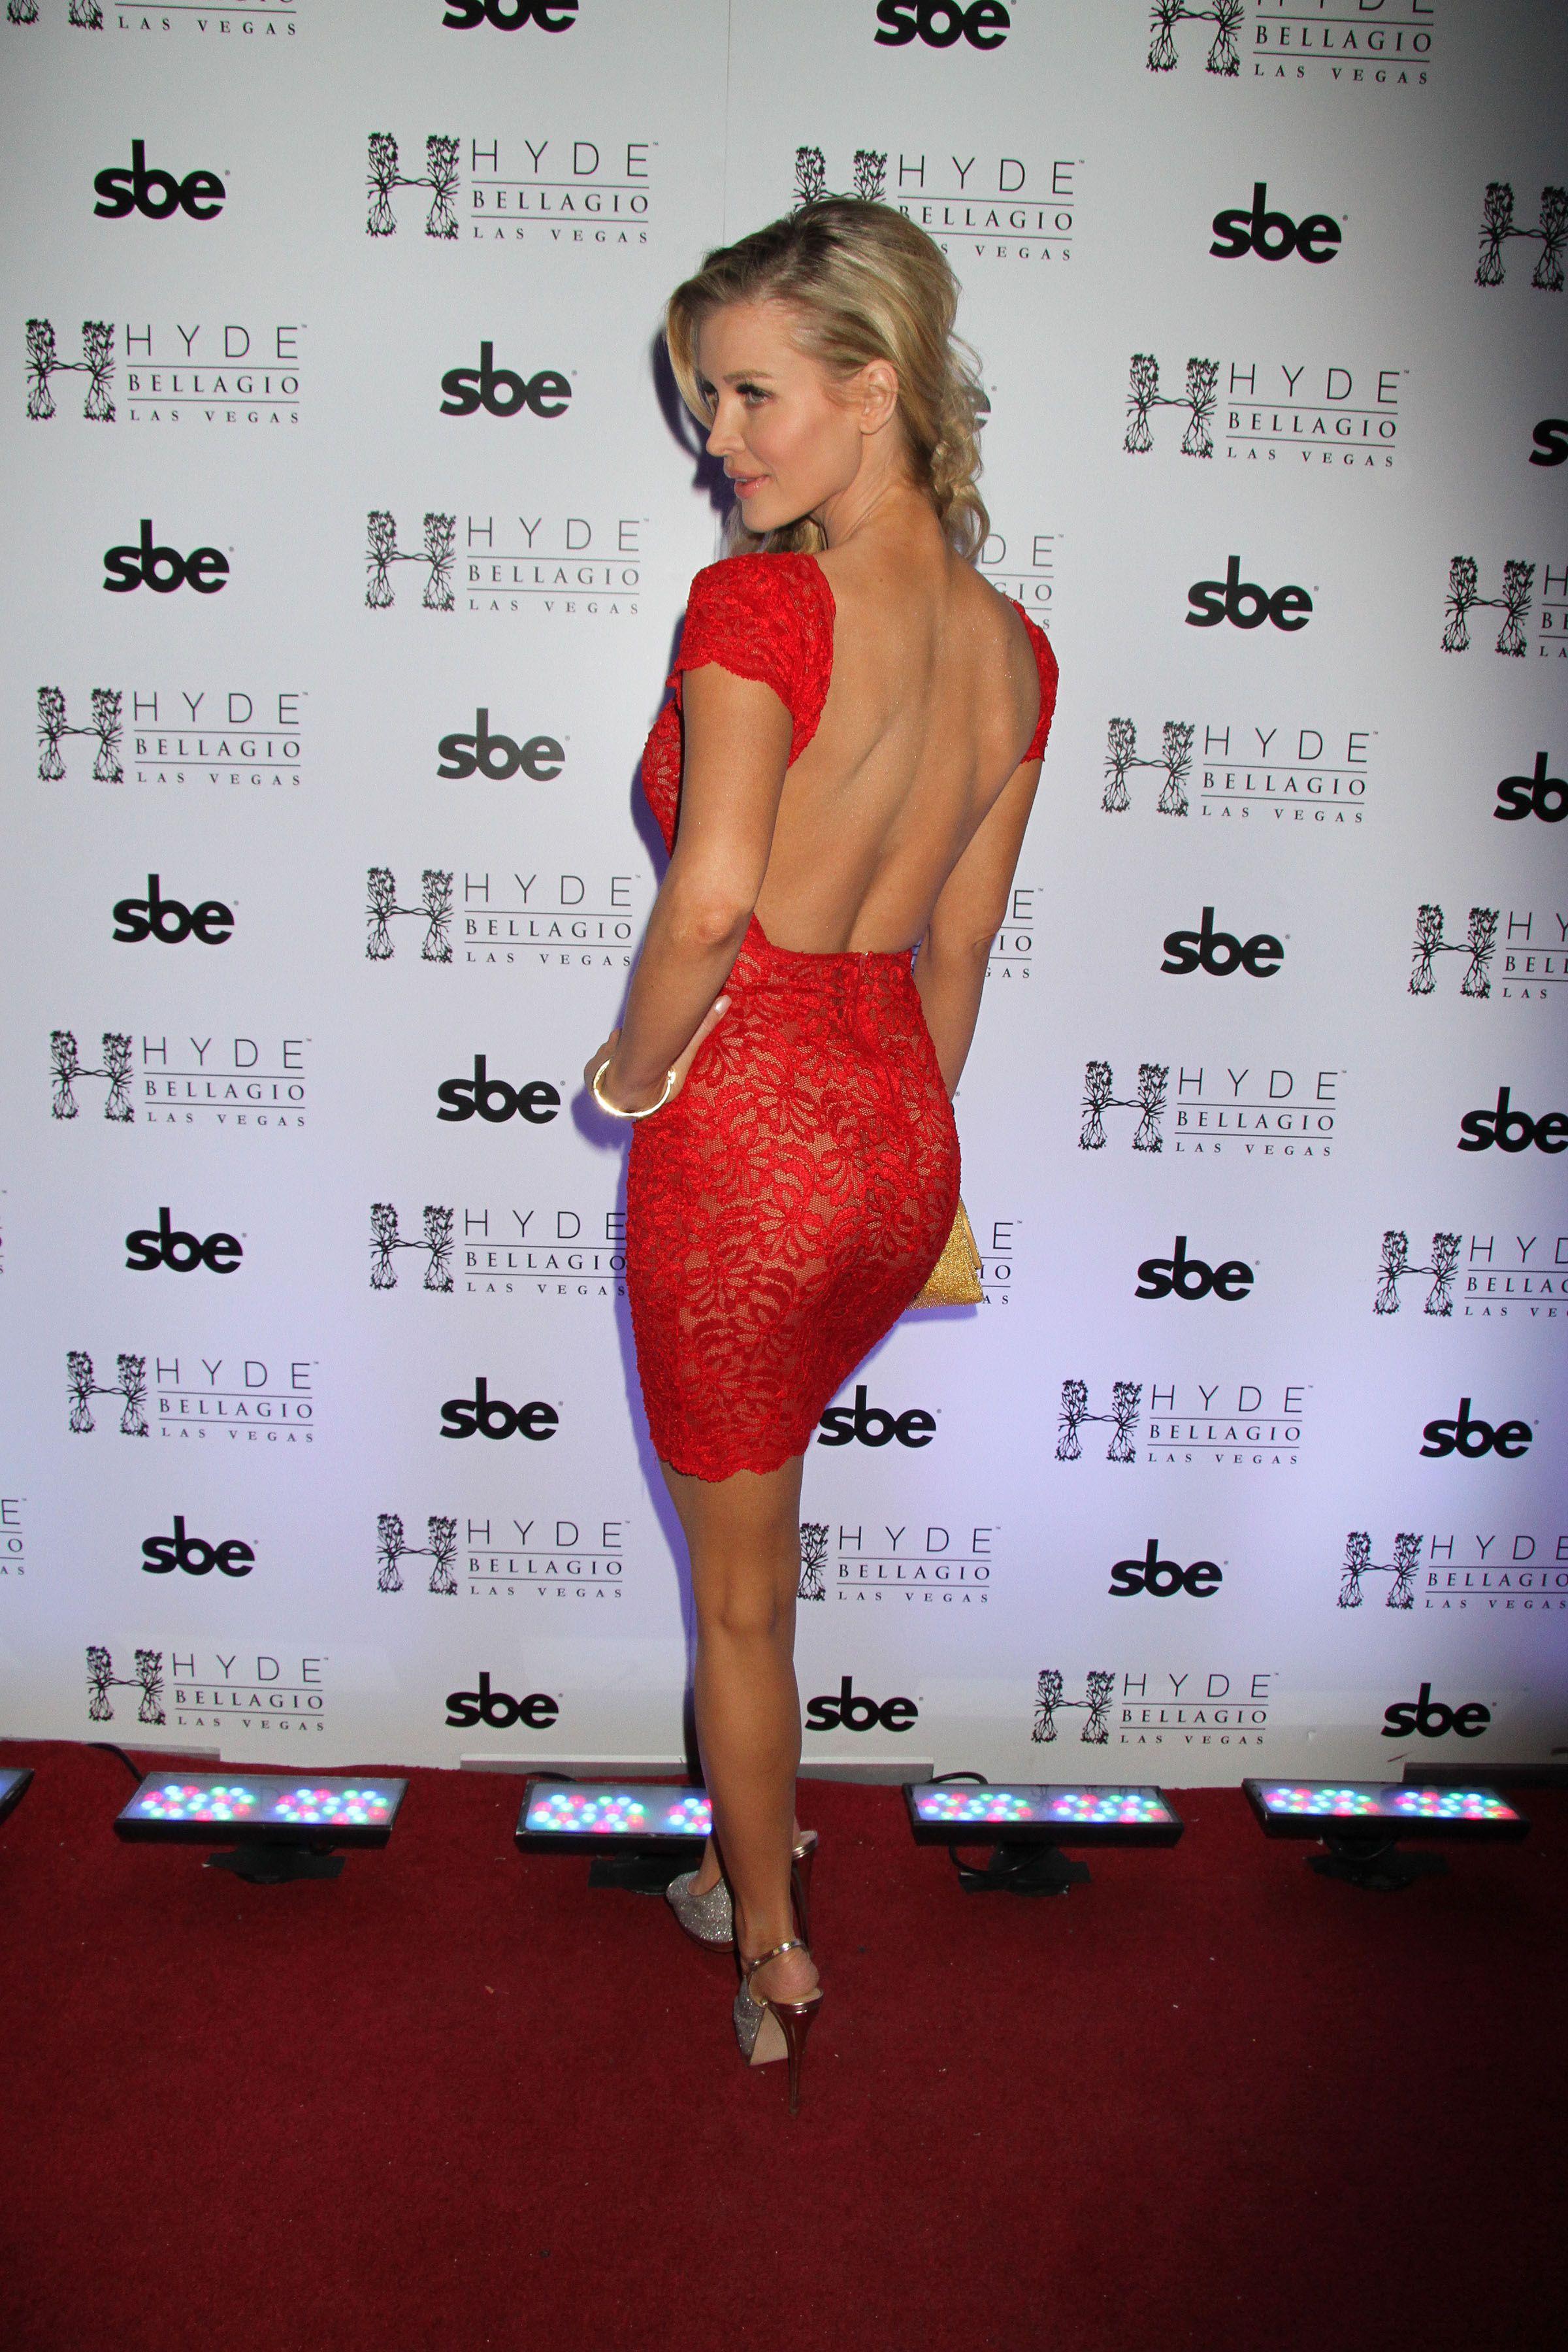 Joanna Krupa – Hosts Hyde Bellagio in Vegas for Super Bowl weekend ...